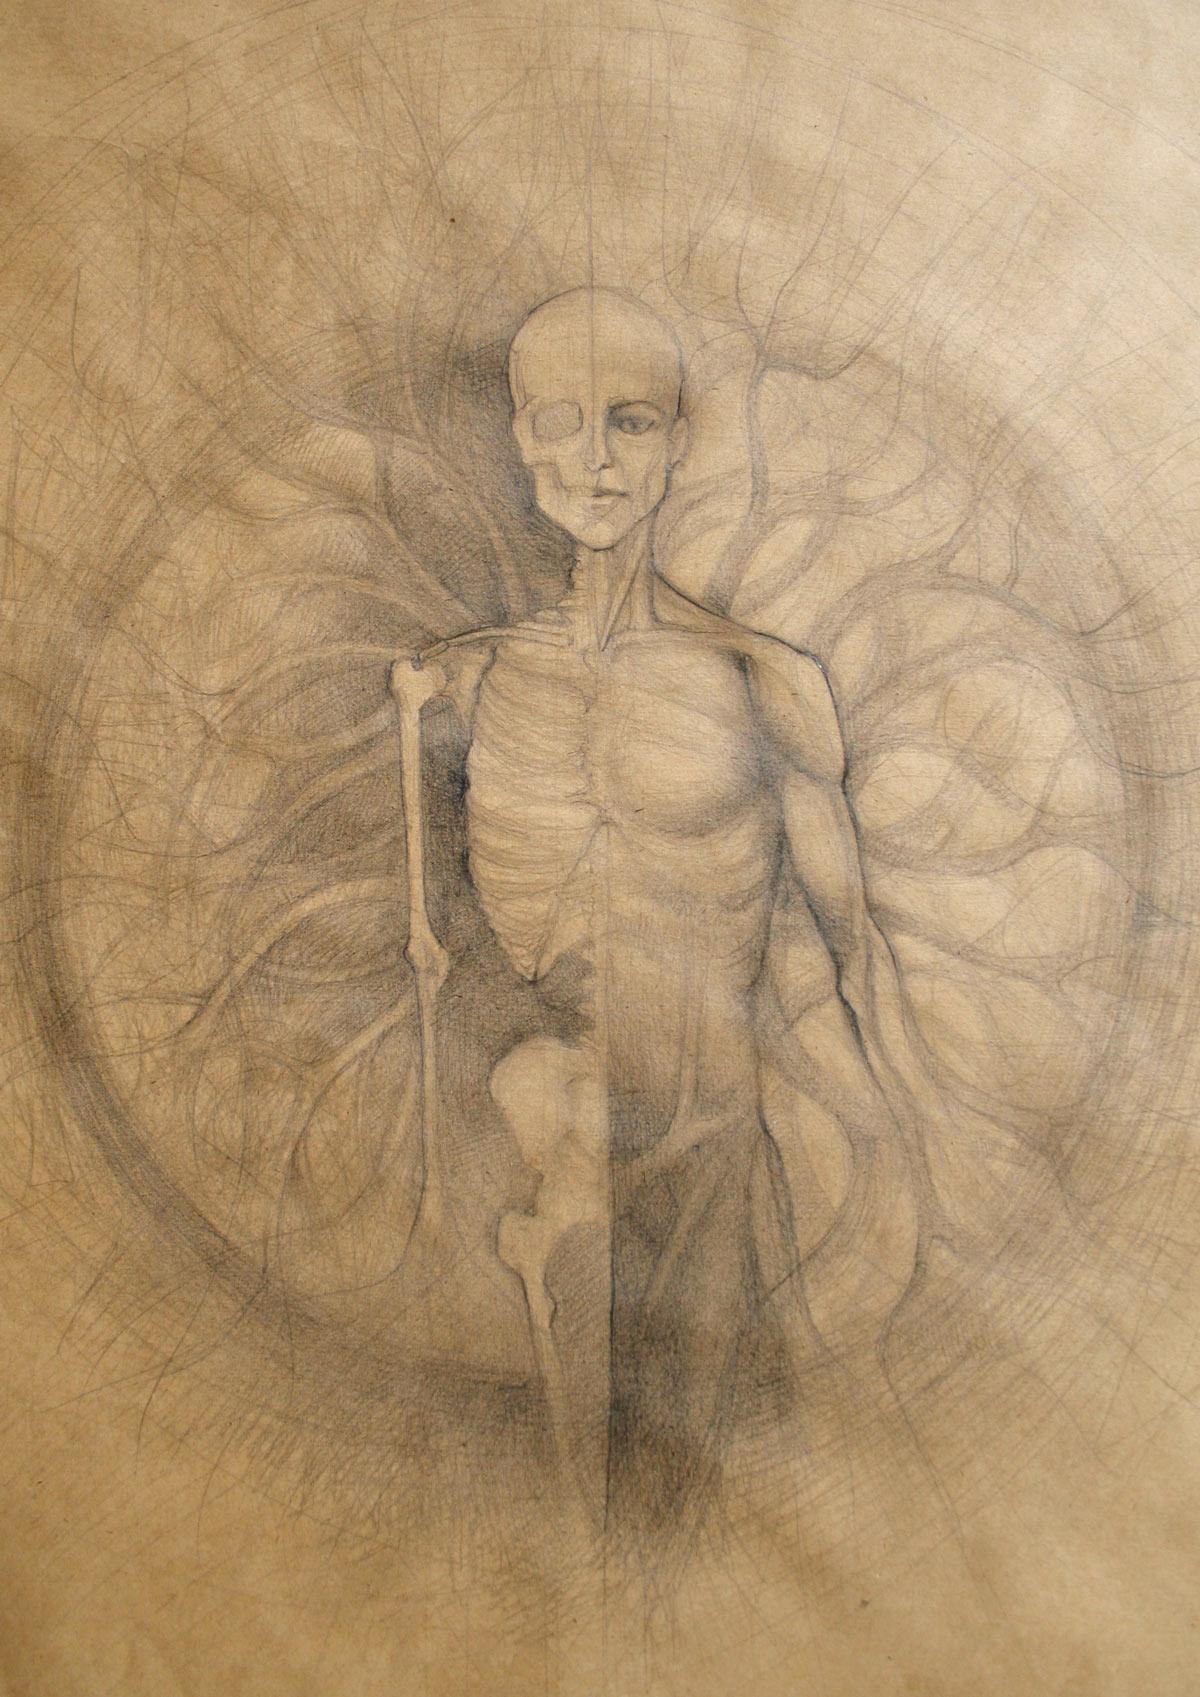 humanos-original-drawing-1200px.jpg